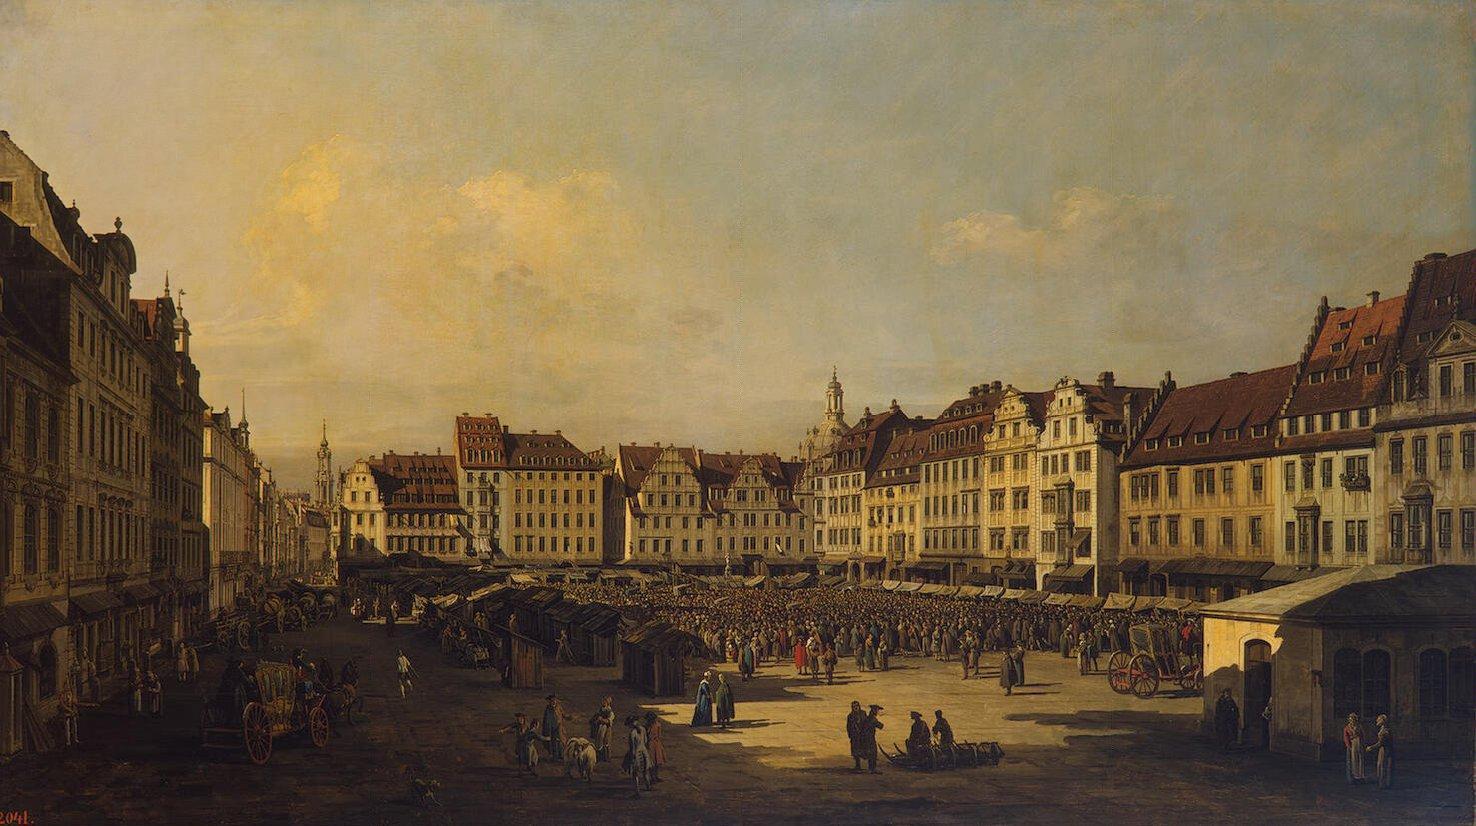 [[[ Беллотто, Бернардо - Площадь Cтарого рынка в Дрездене